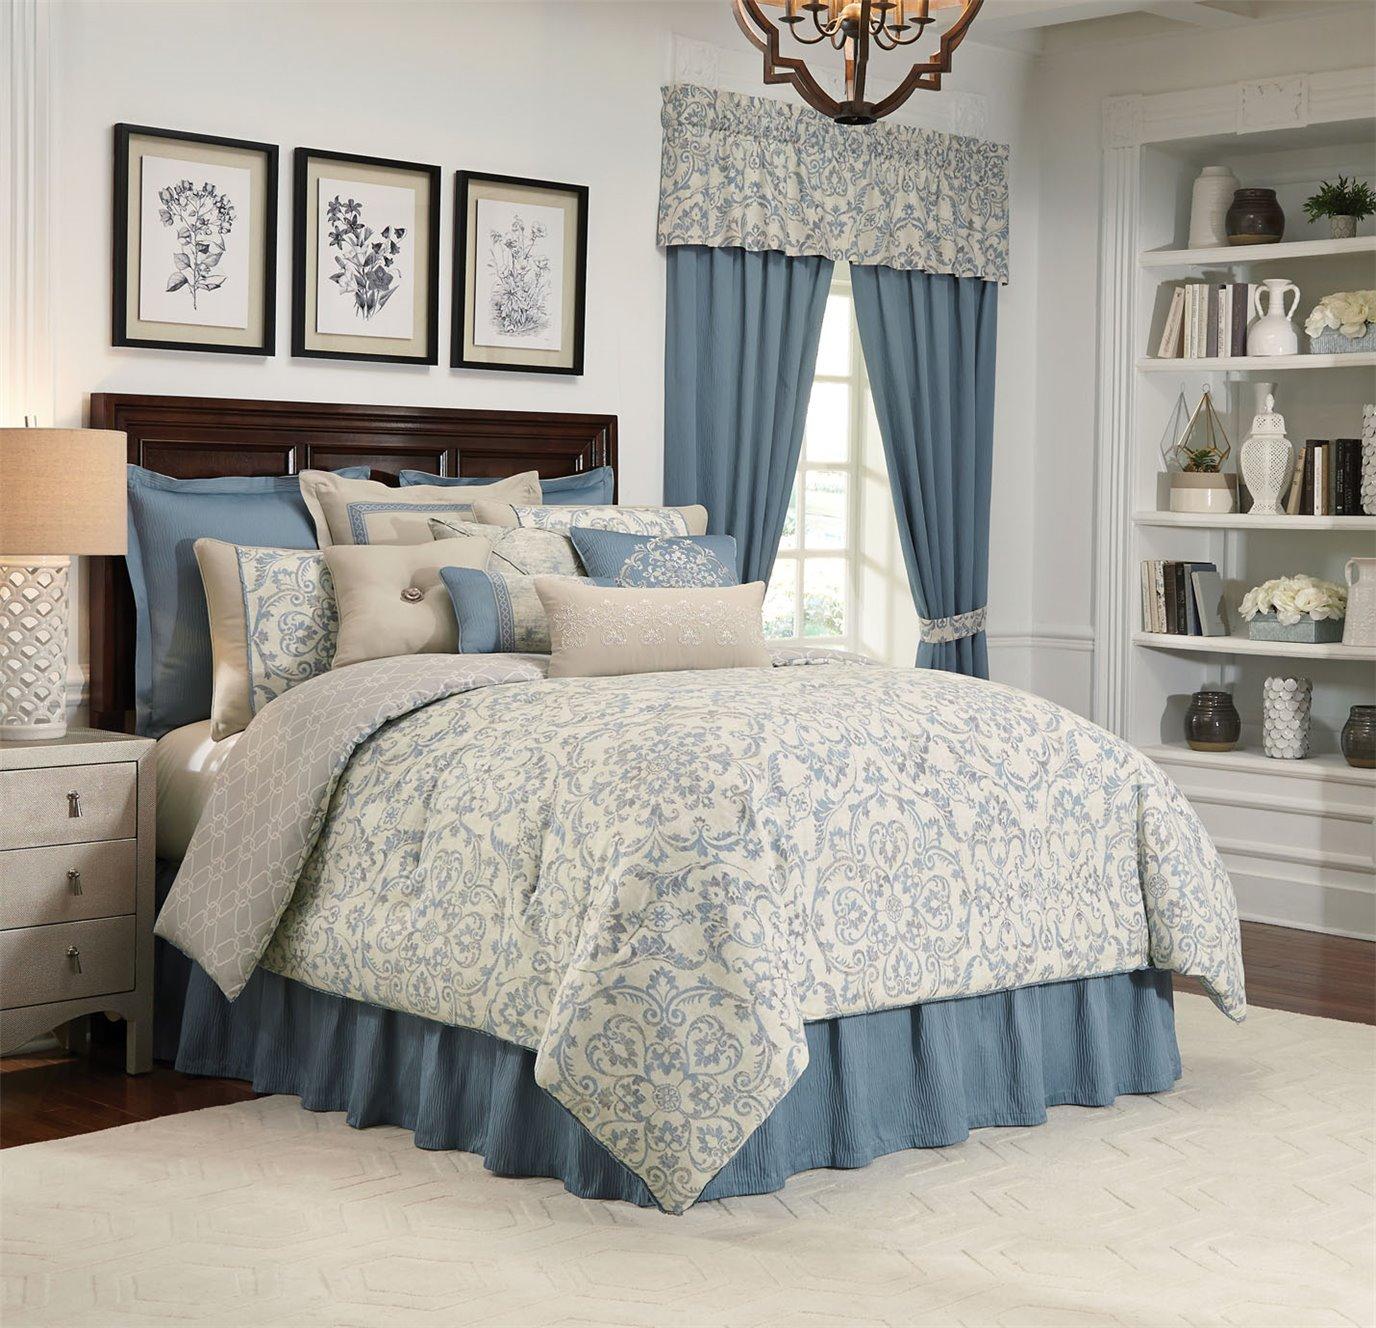 Placio 4 Piece Queen Comforter Set